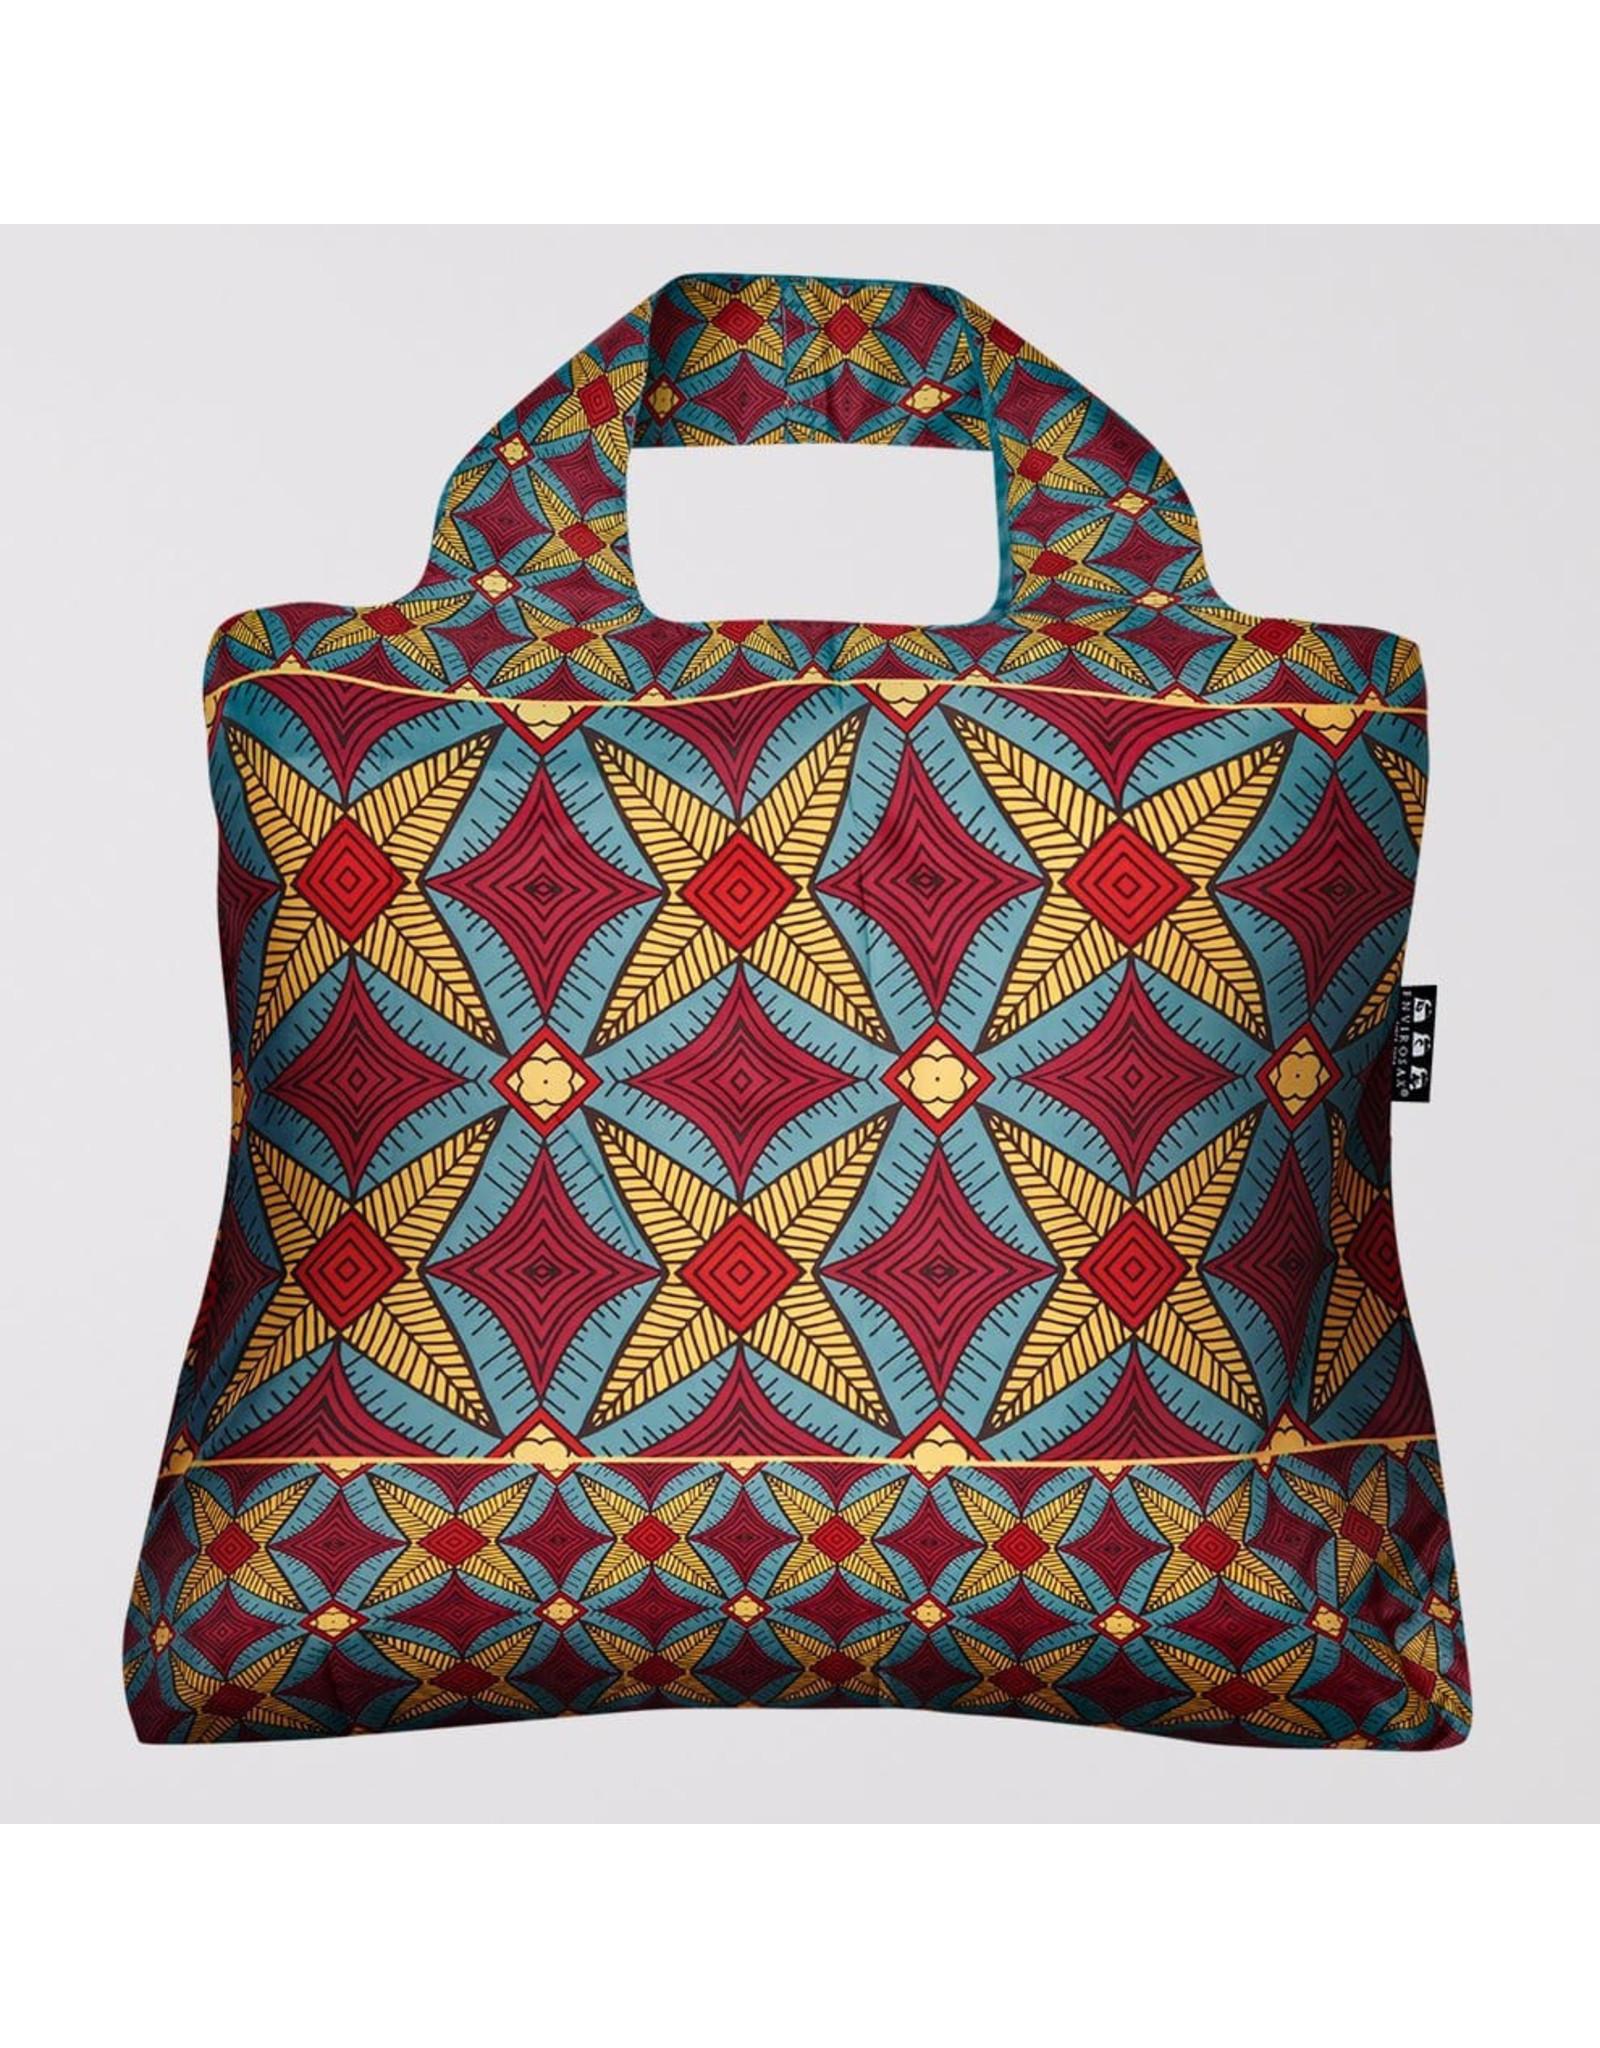 Envirosax Ankara Stars - Pocket Sized Reusuable Bag from Envirosax